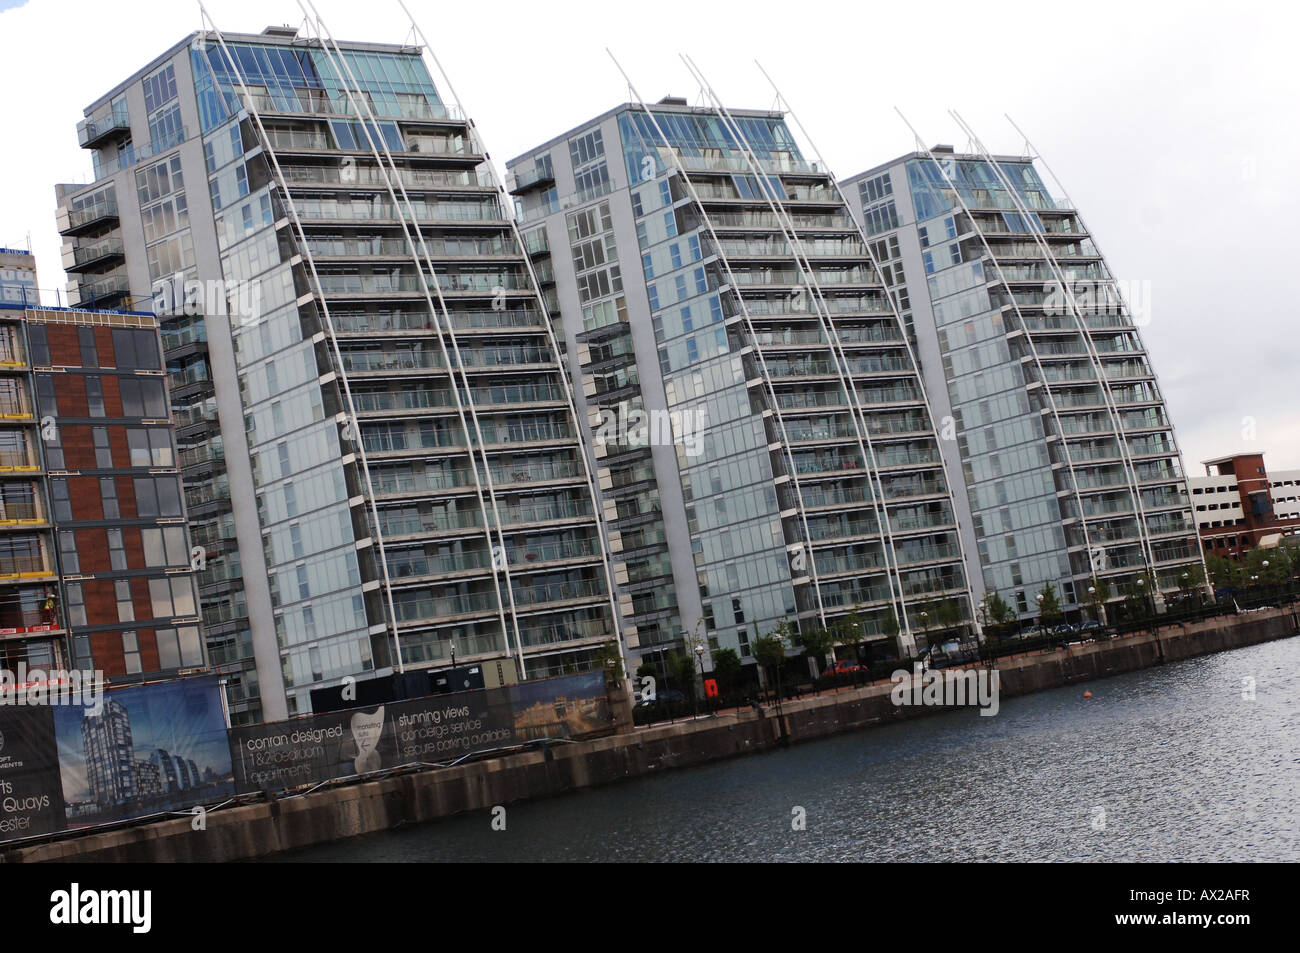 Salford Quays new apartment development - Stock Image